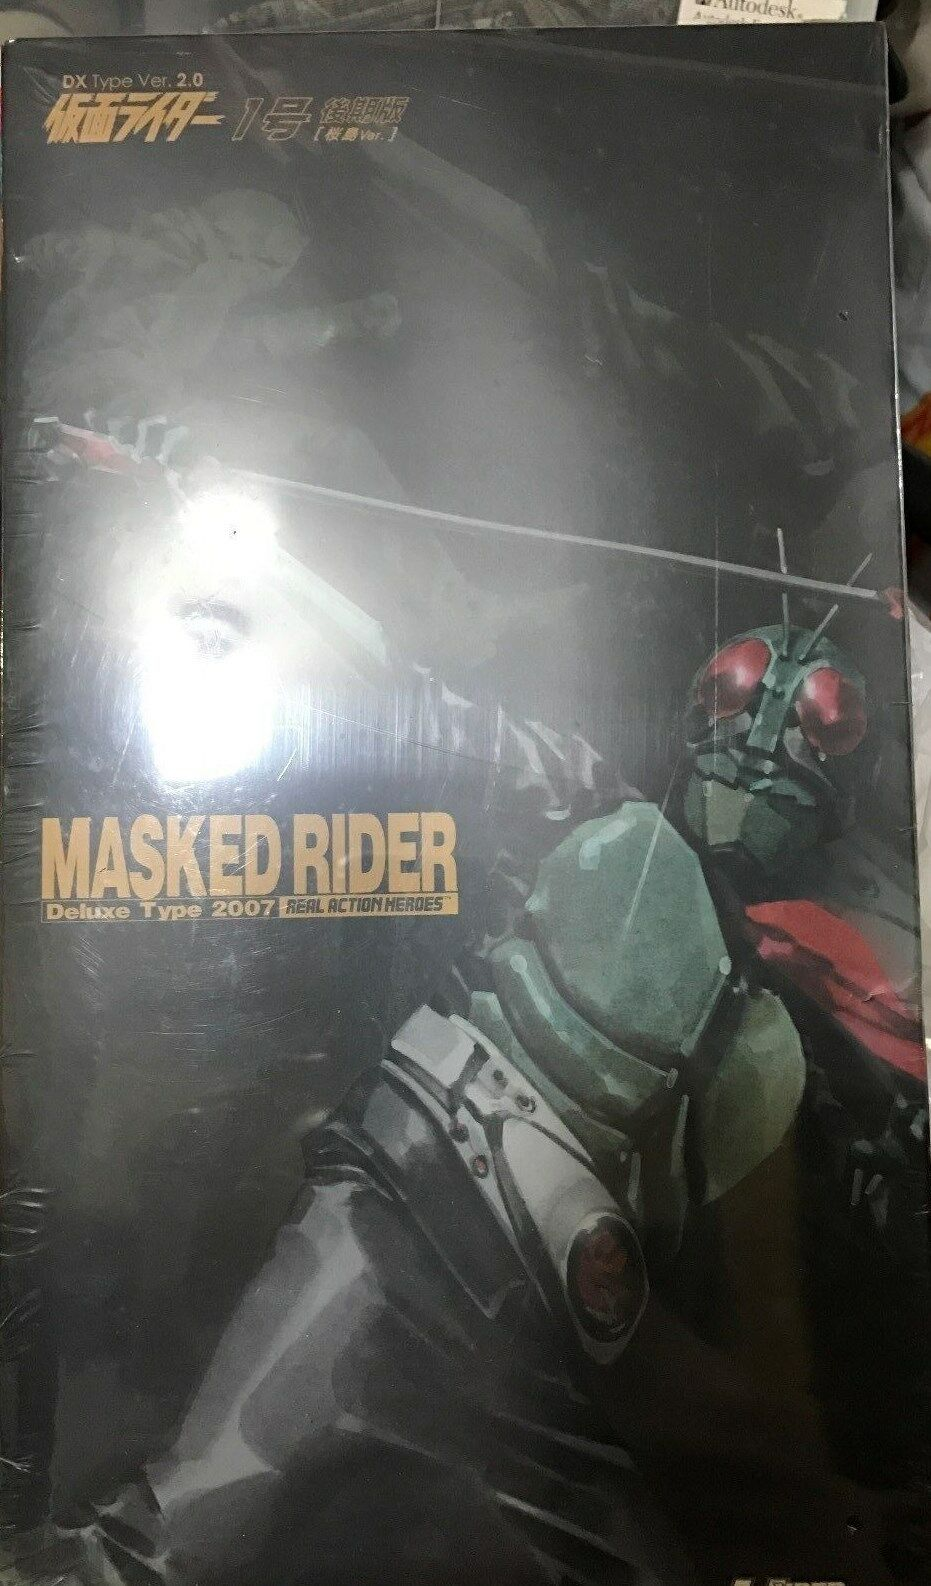 Medicom 12 DX Masked Rider Rider Rider Sakurajima Rider 1 one Figure rx e32f63